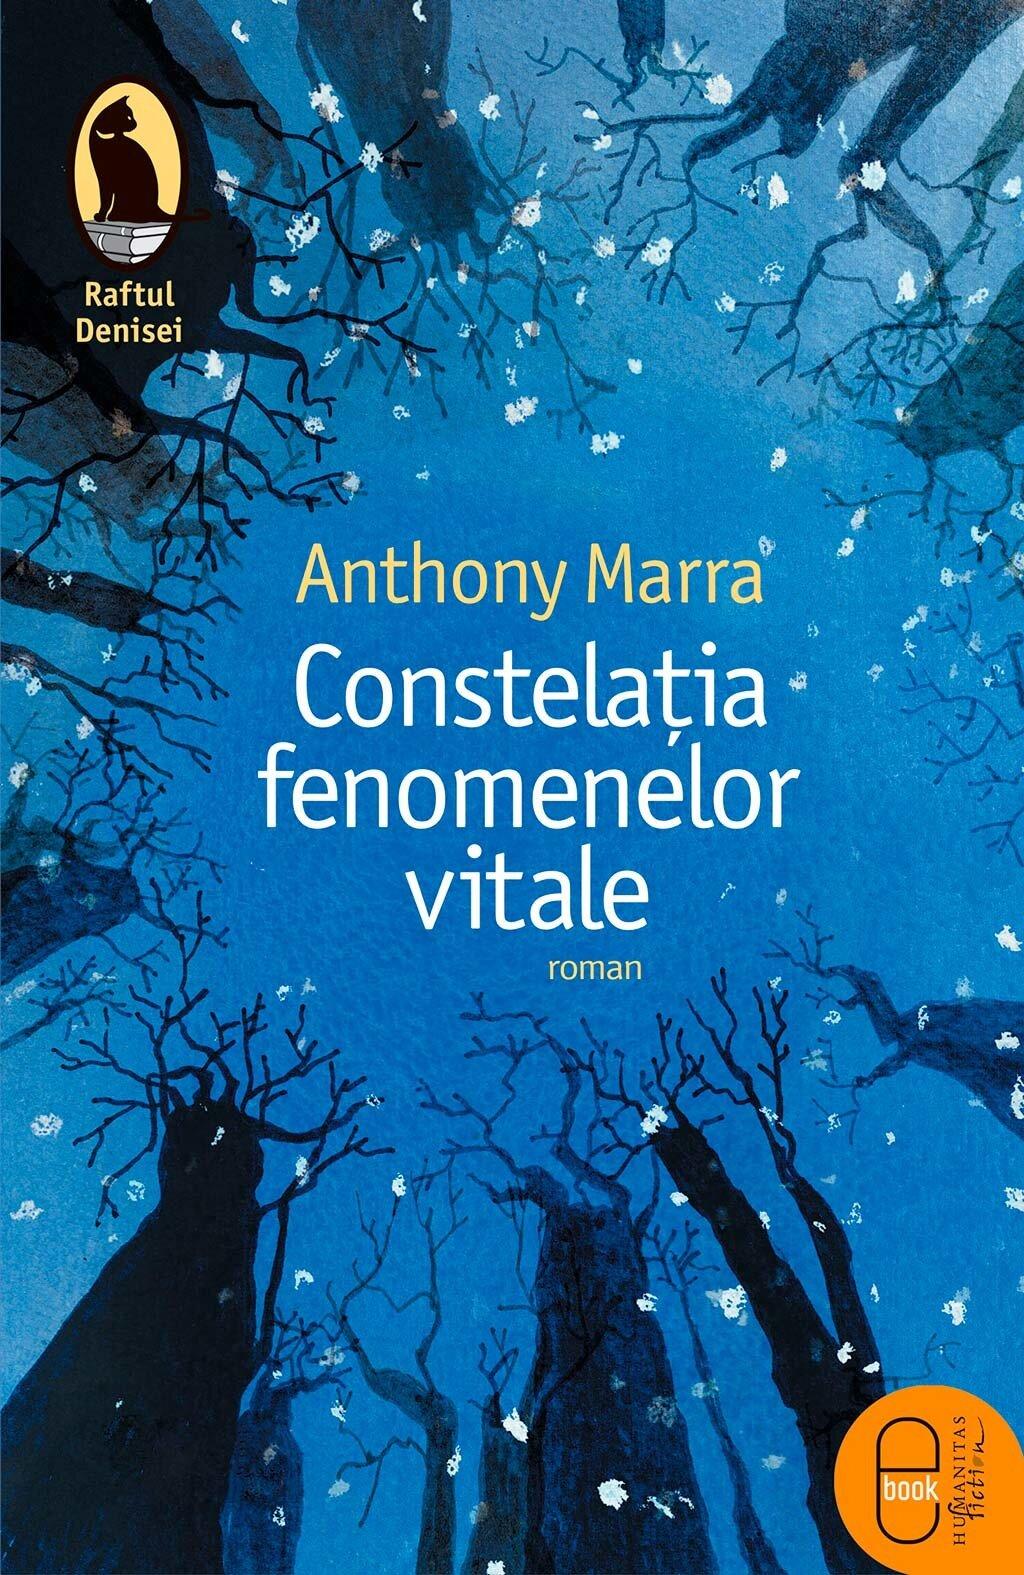 Constelatia fenomenelor vitale PDF (Download eBook)